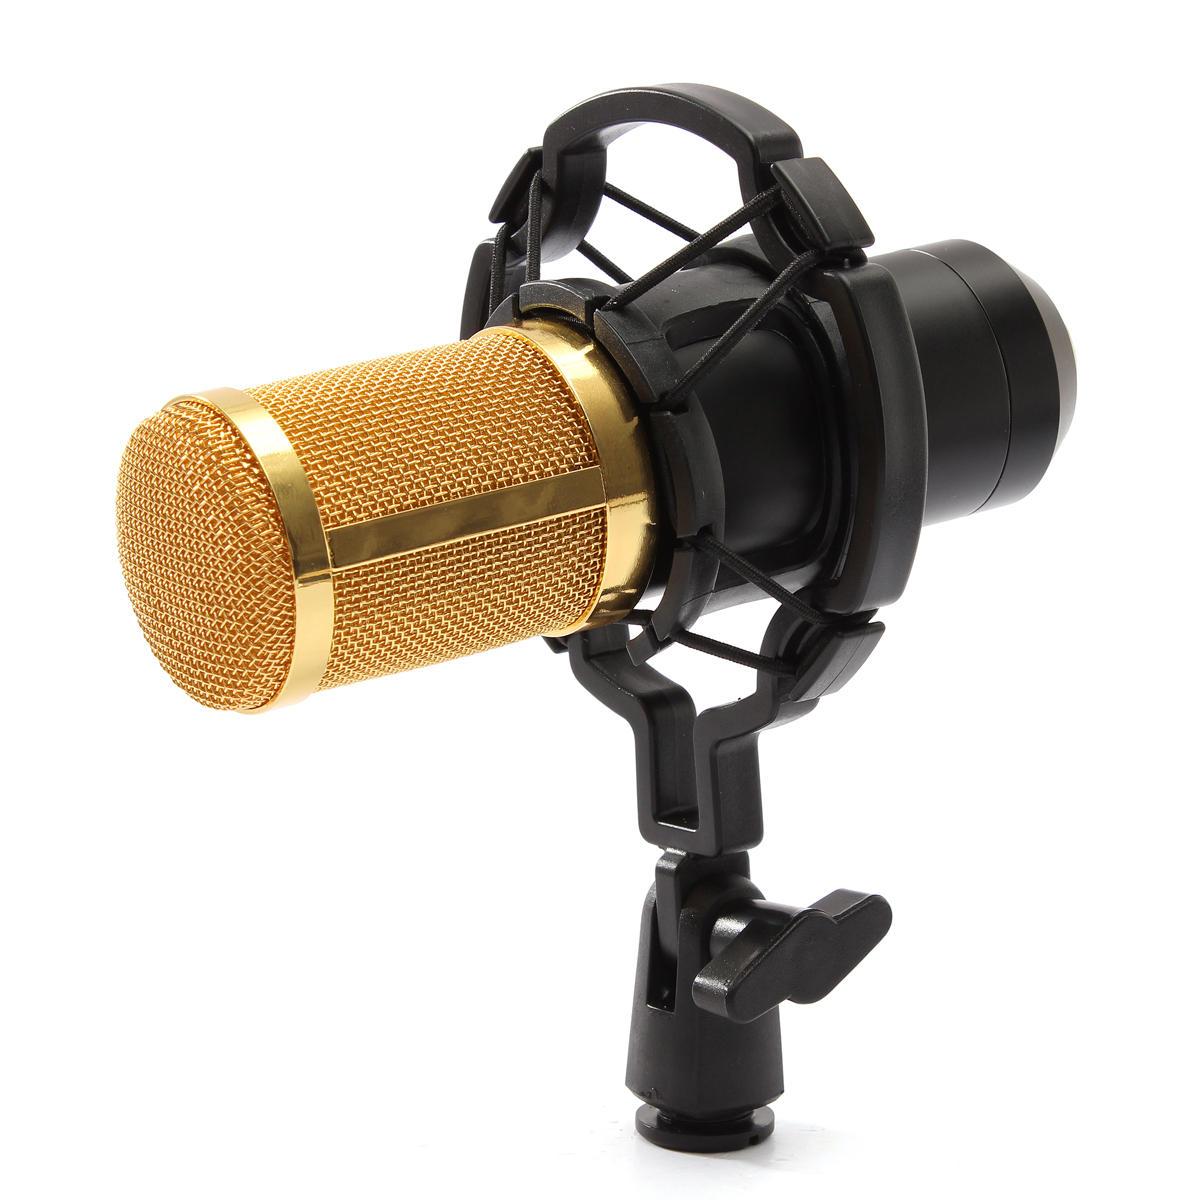 Иллюстрация на тему Микрофон для записи видео на YouTube: для ютуберов и съемки